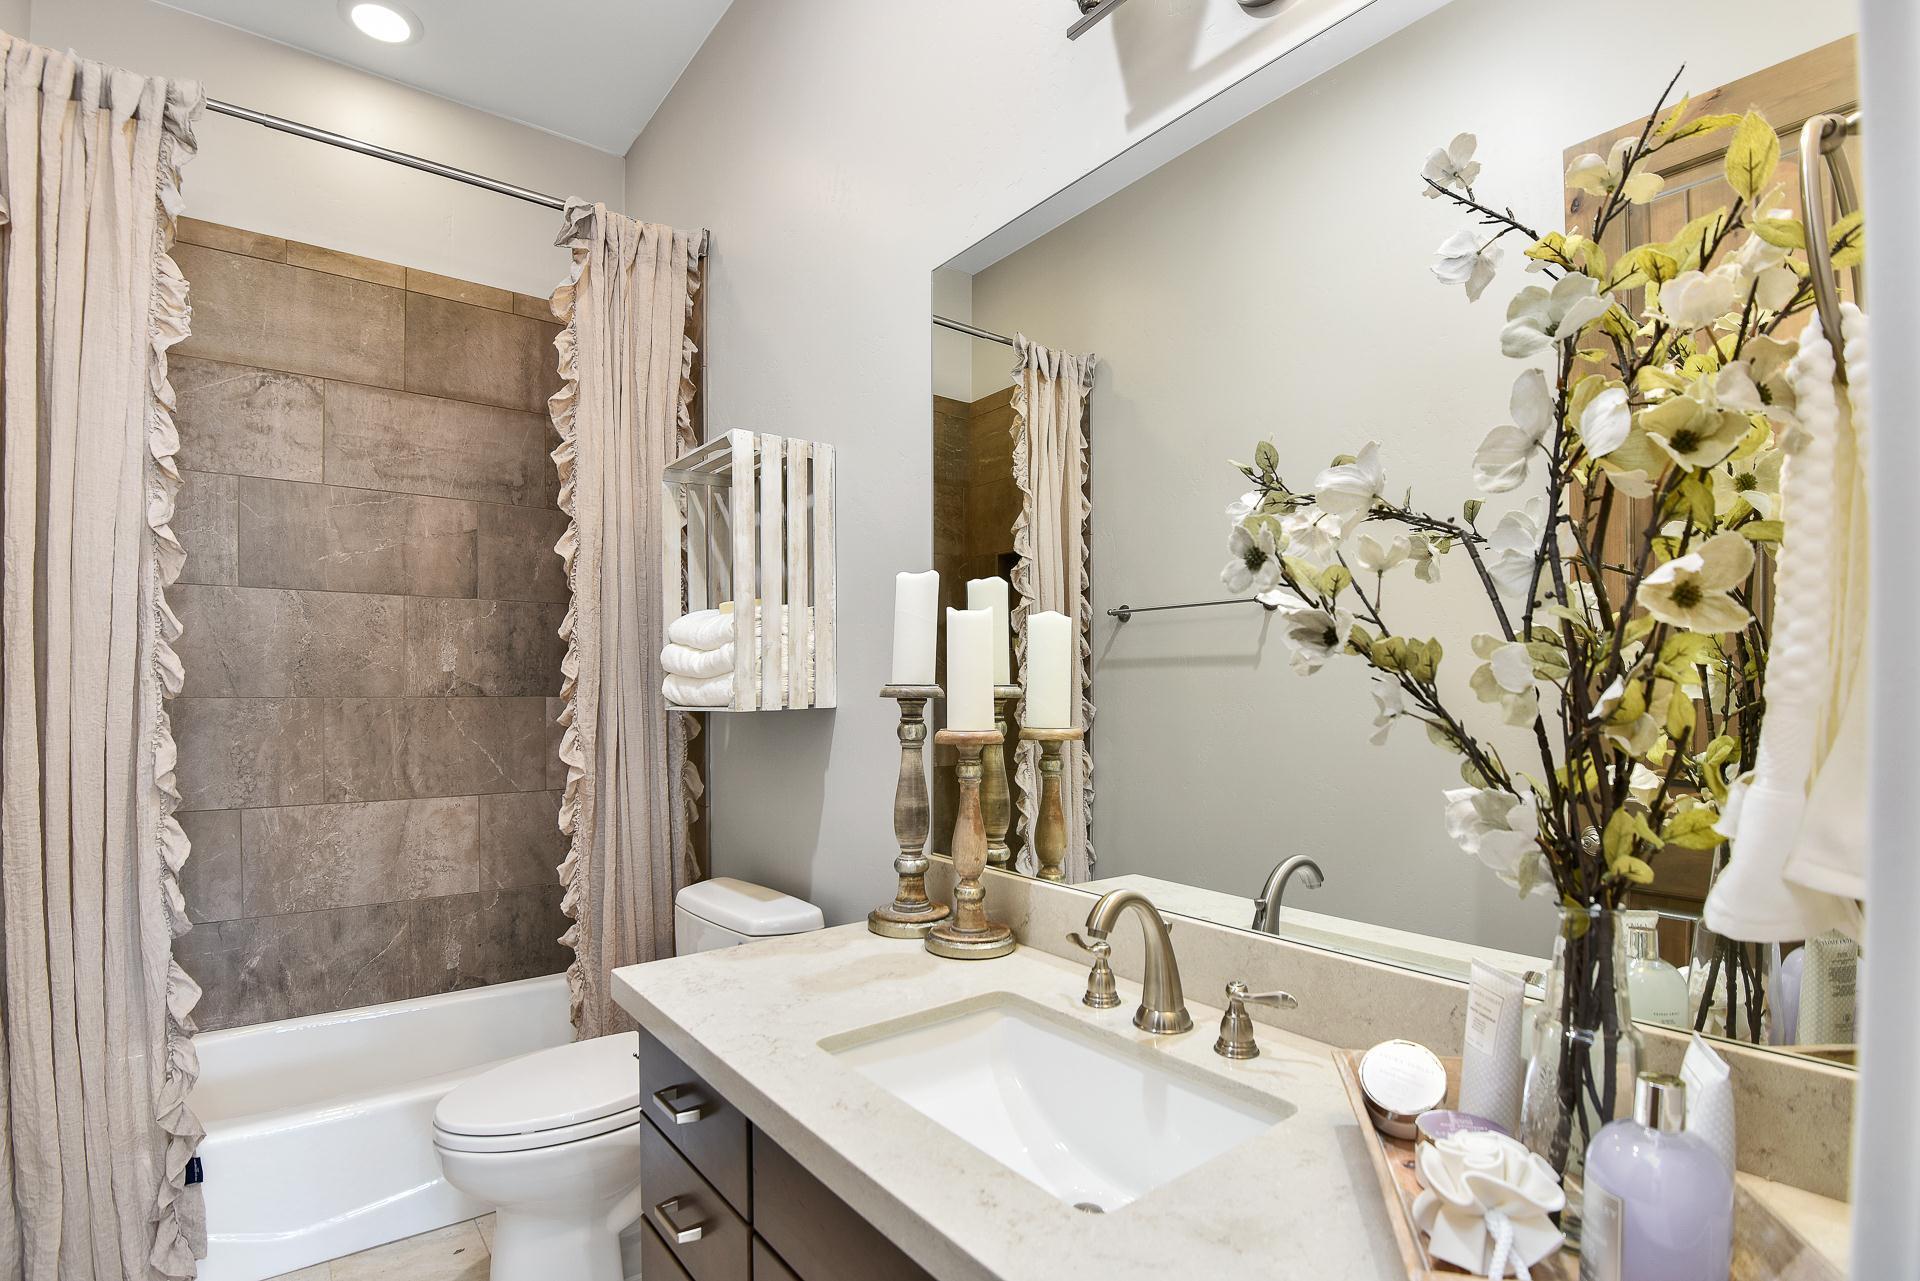 Bathroom featured in the Aspen Ridge Plan 6 By Capstone Homes in Flagstaff, AZ